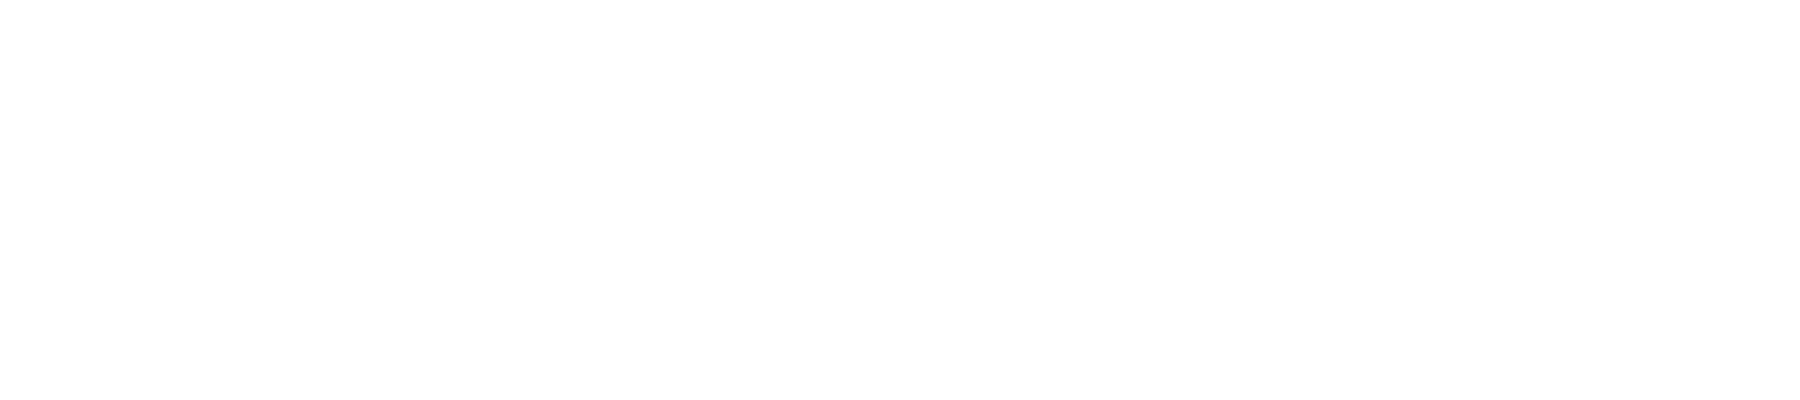 Appli Meister